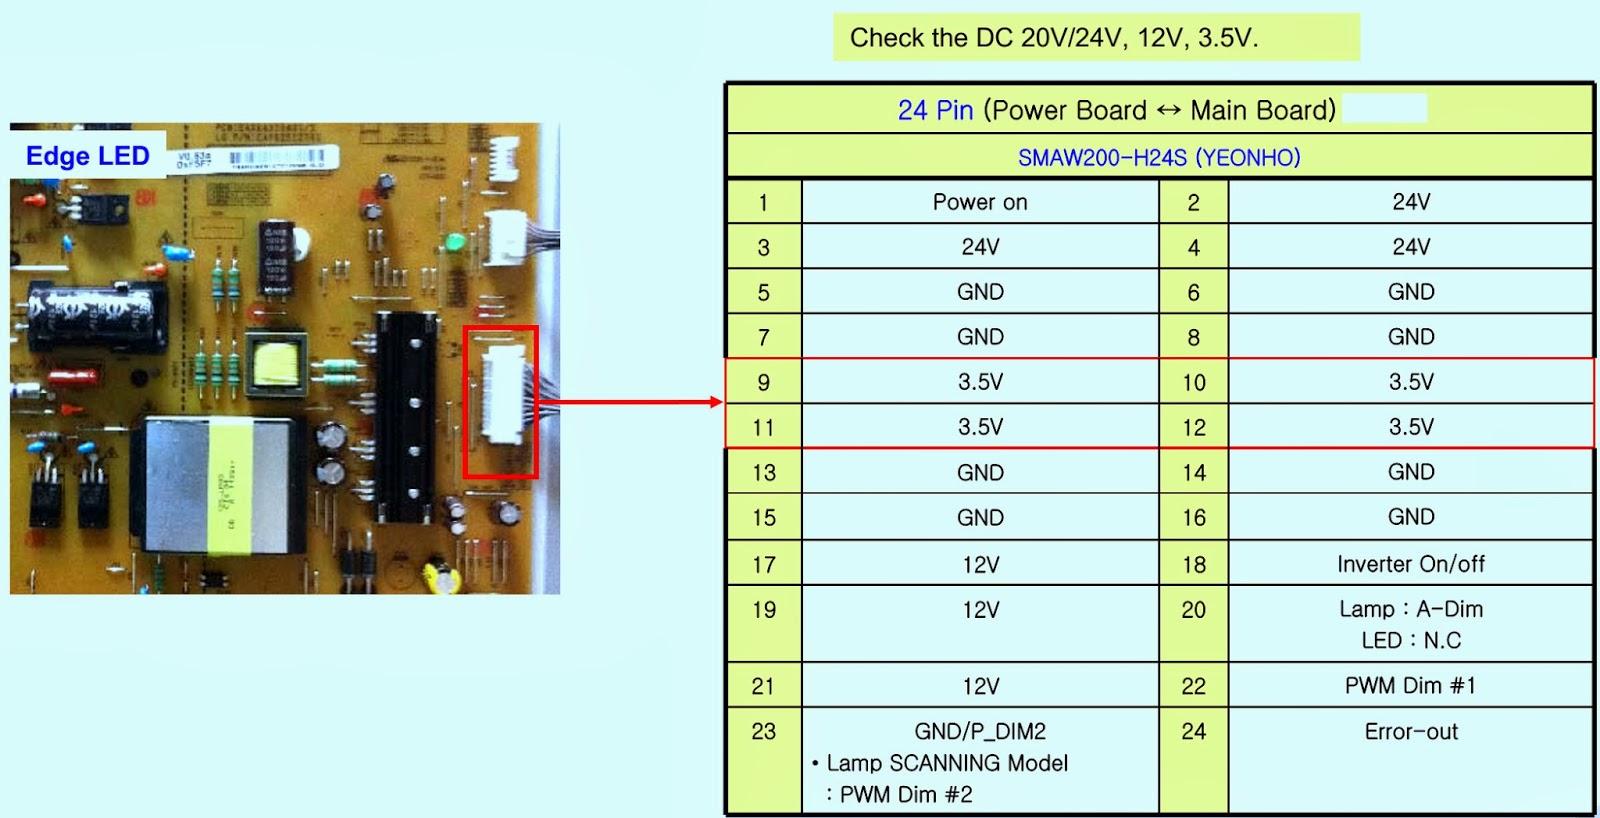 Kato Signal Wiring Diagram Wiring Diagrams moreover Betaflight F3 Wiring Diagram furthermore Traffic Light Controller Circuit further Westek Touch Dimmer Wiring Diagram as well Arduino Basics Controlling Led Part 2. on led circuit diagrams